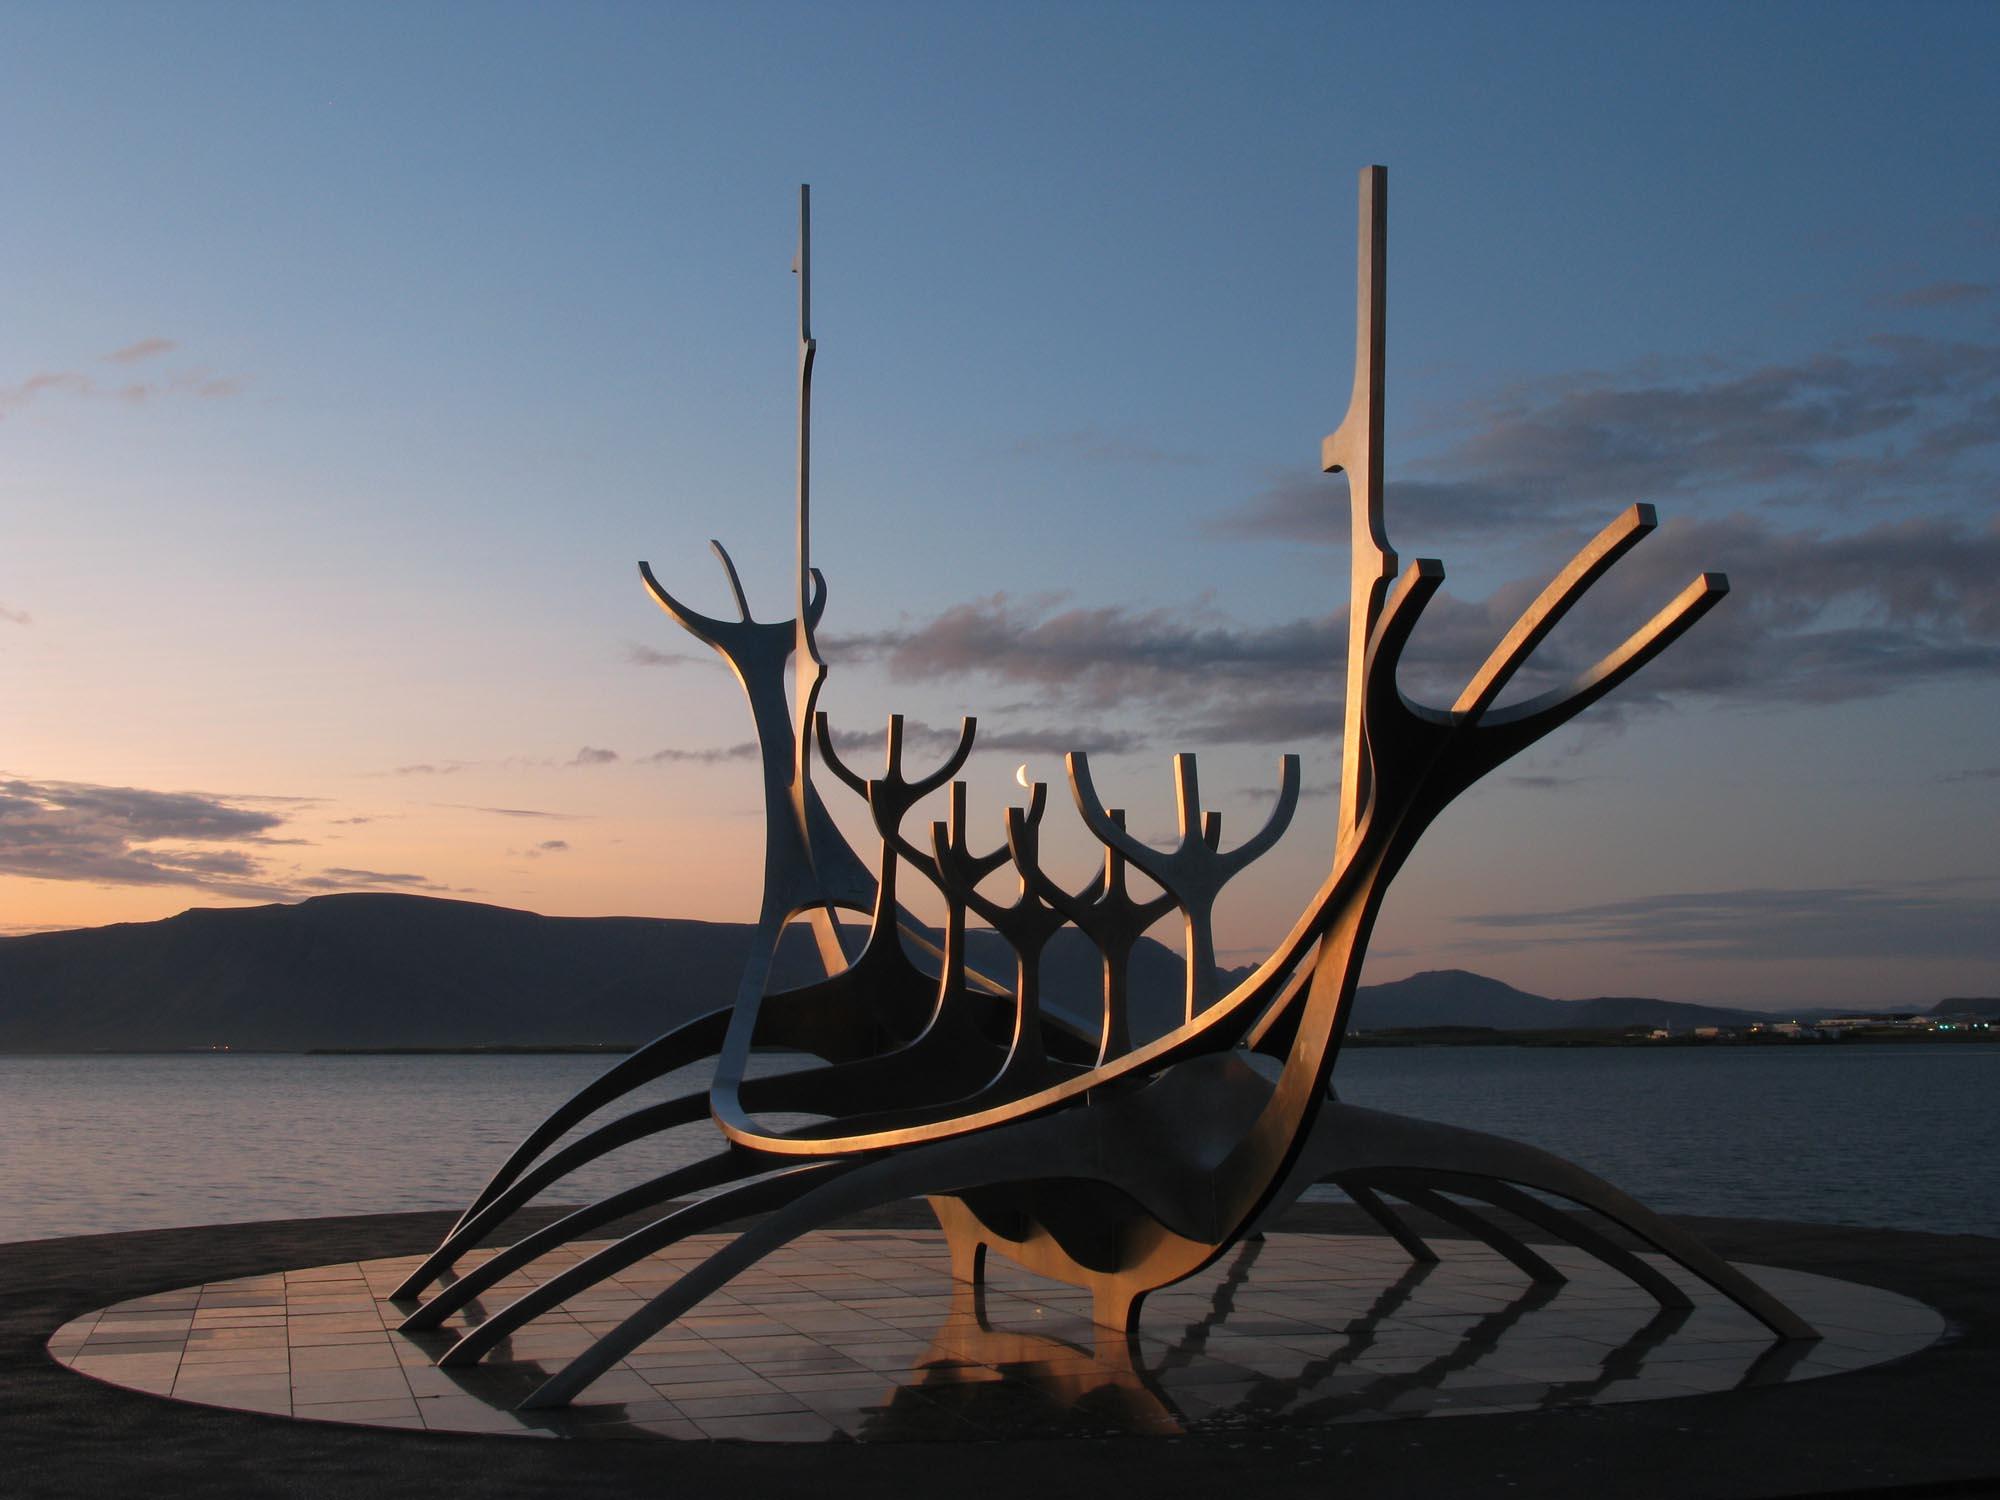 island-reykjavik-wikingerboot-small